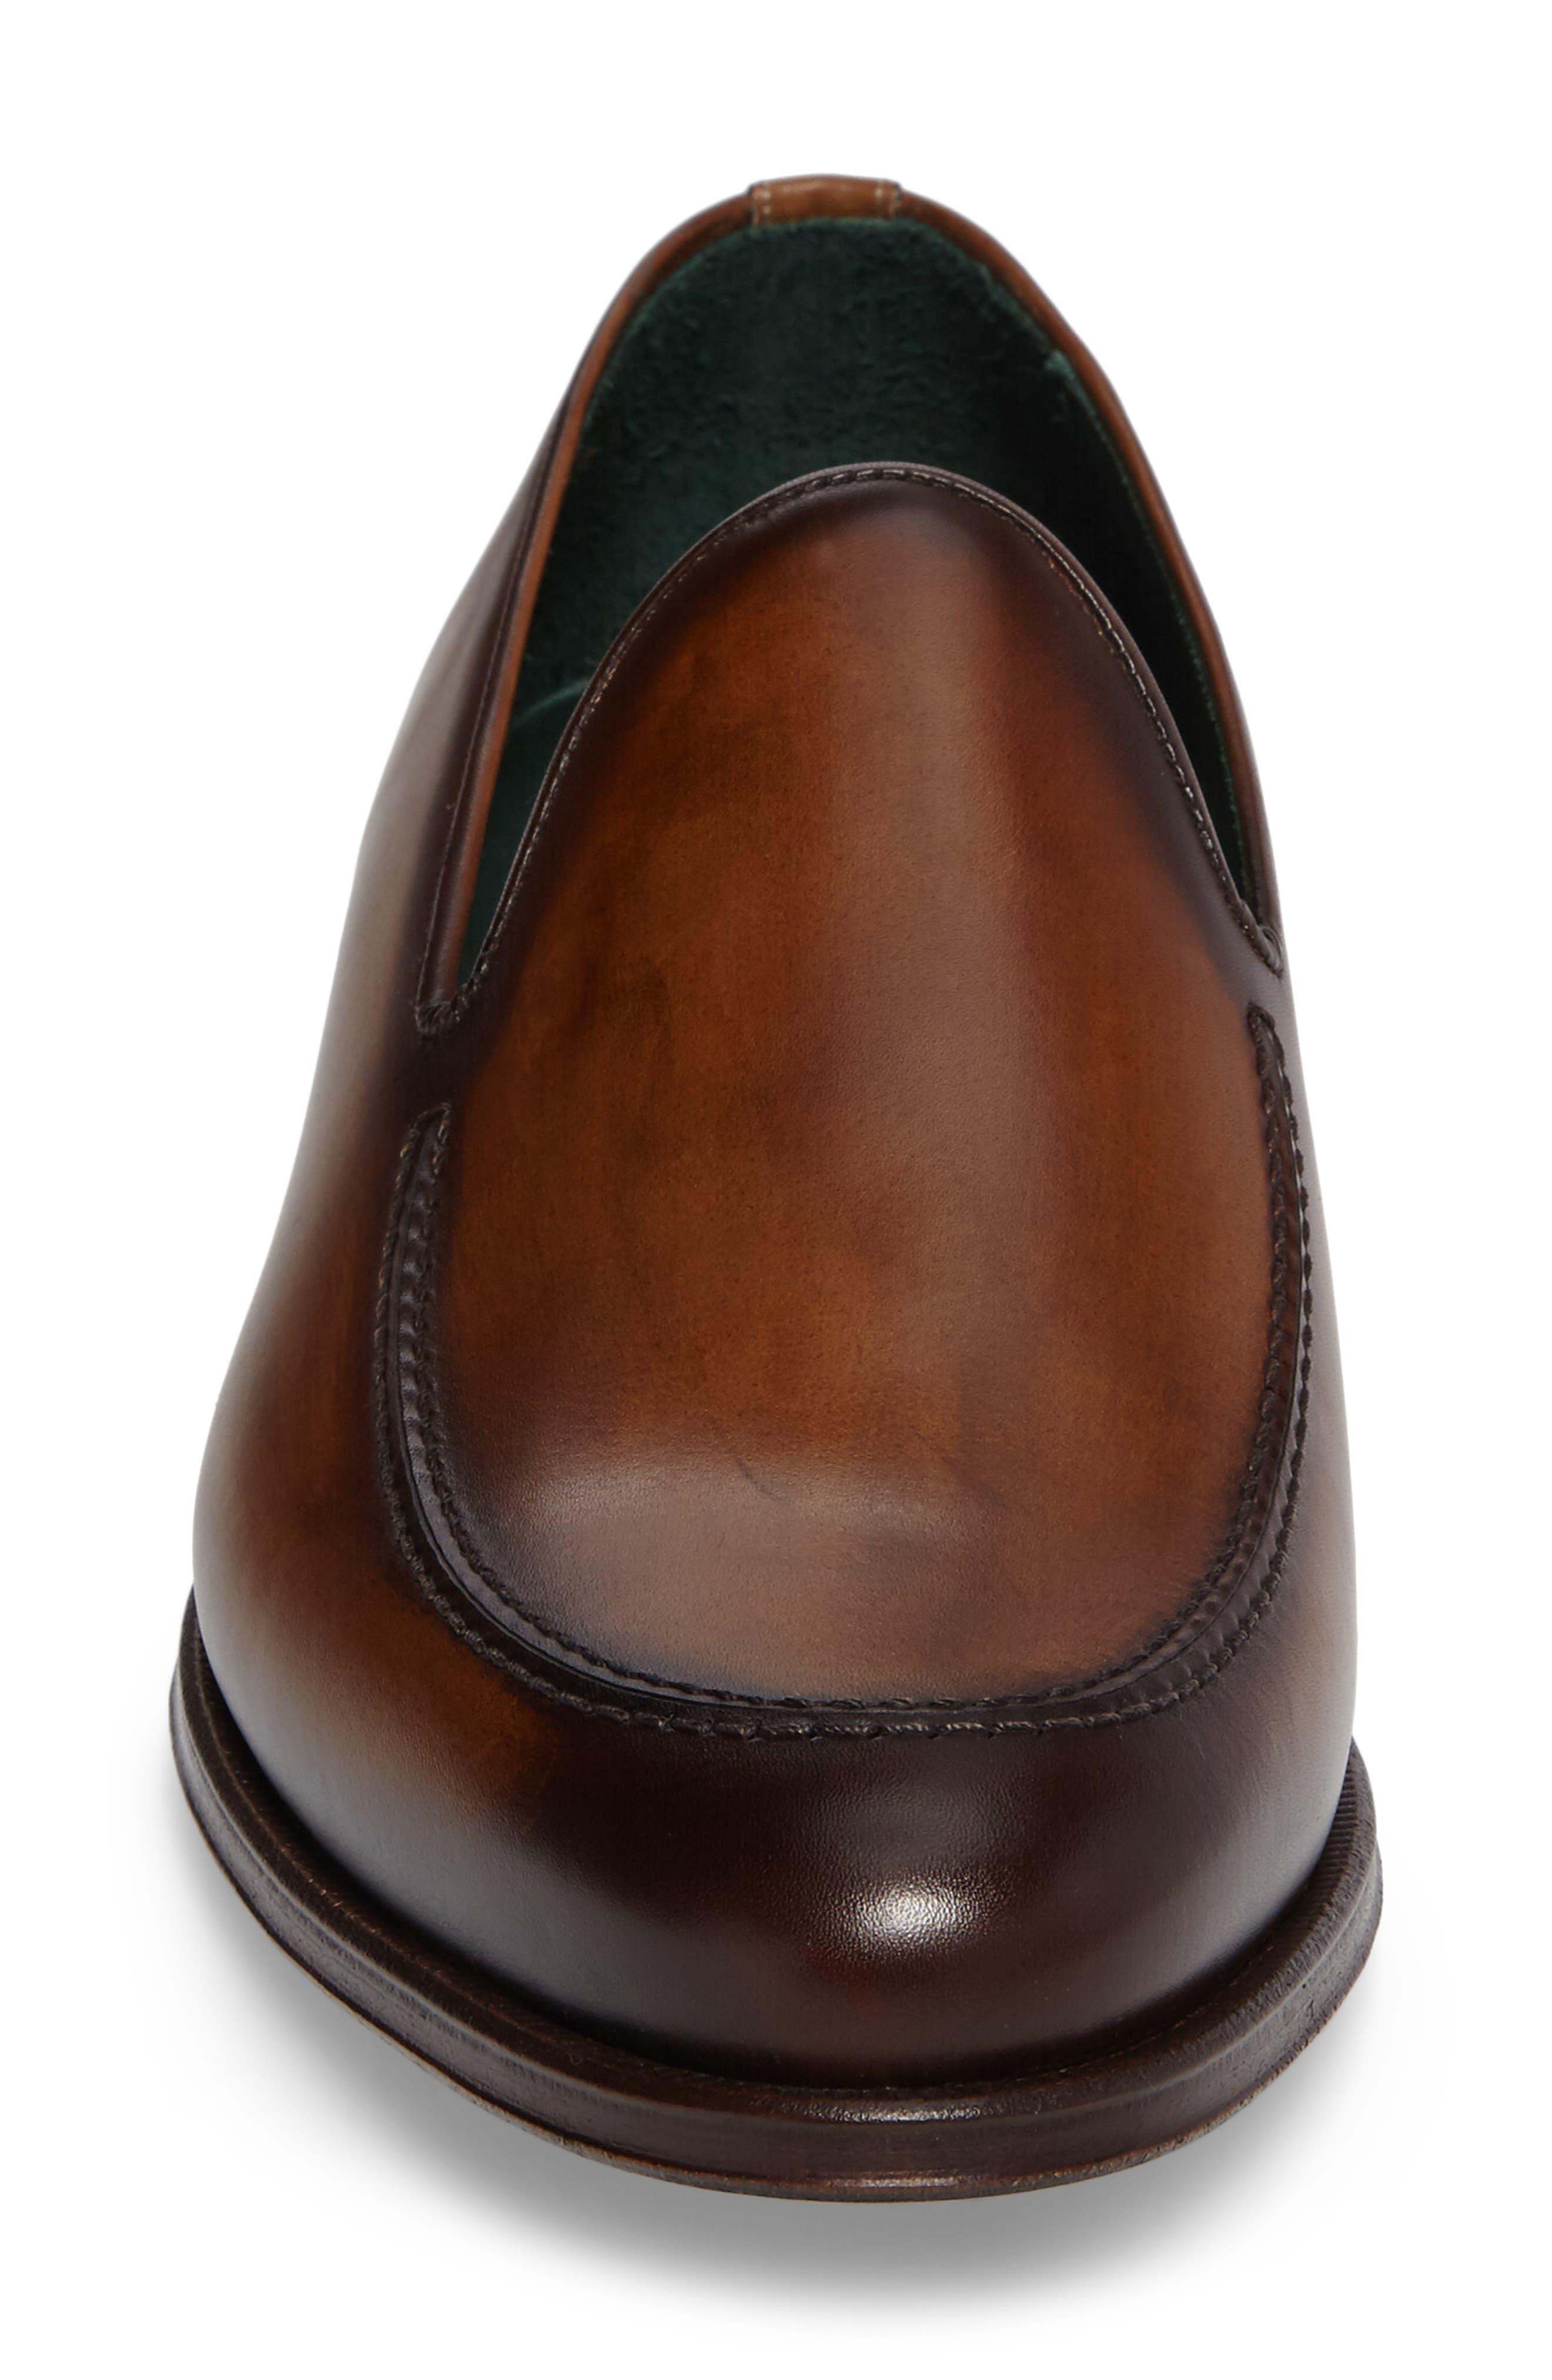 Rodin Apron Toe Loafer,                             Alternate thumbnail 4, color,                             Cognac Leather